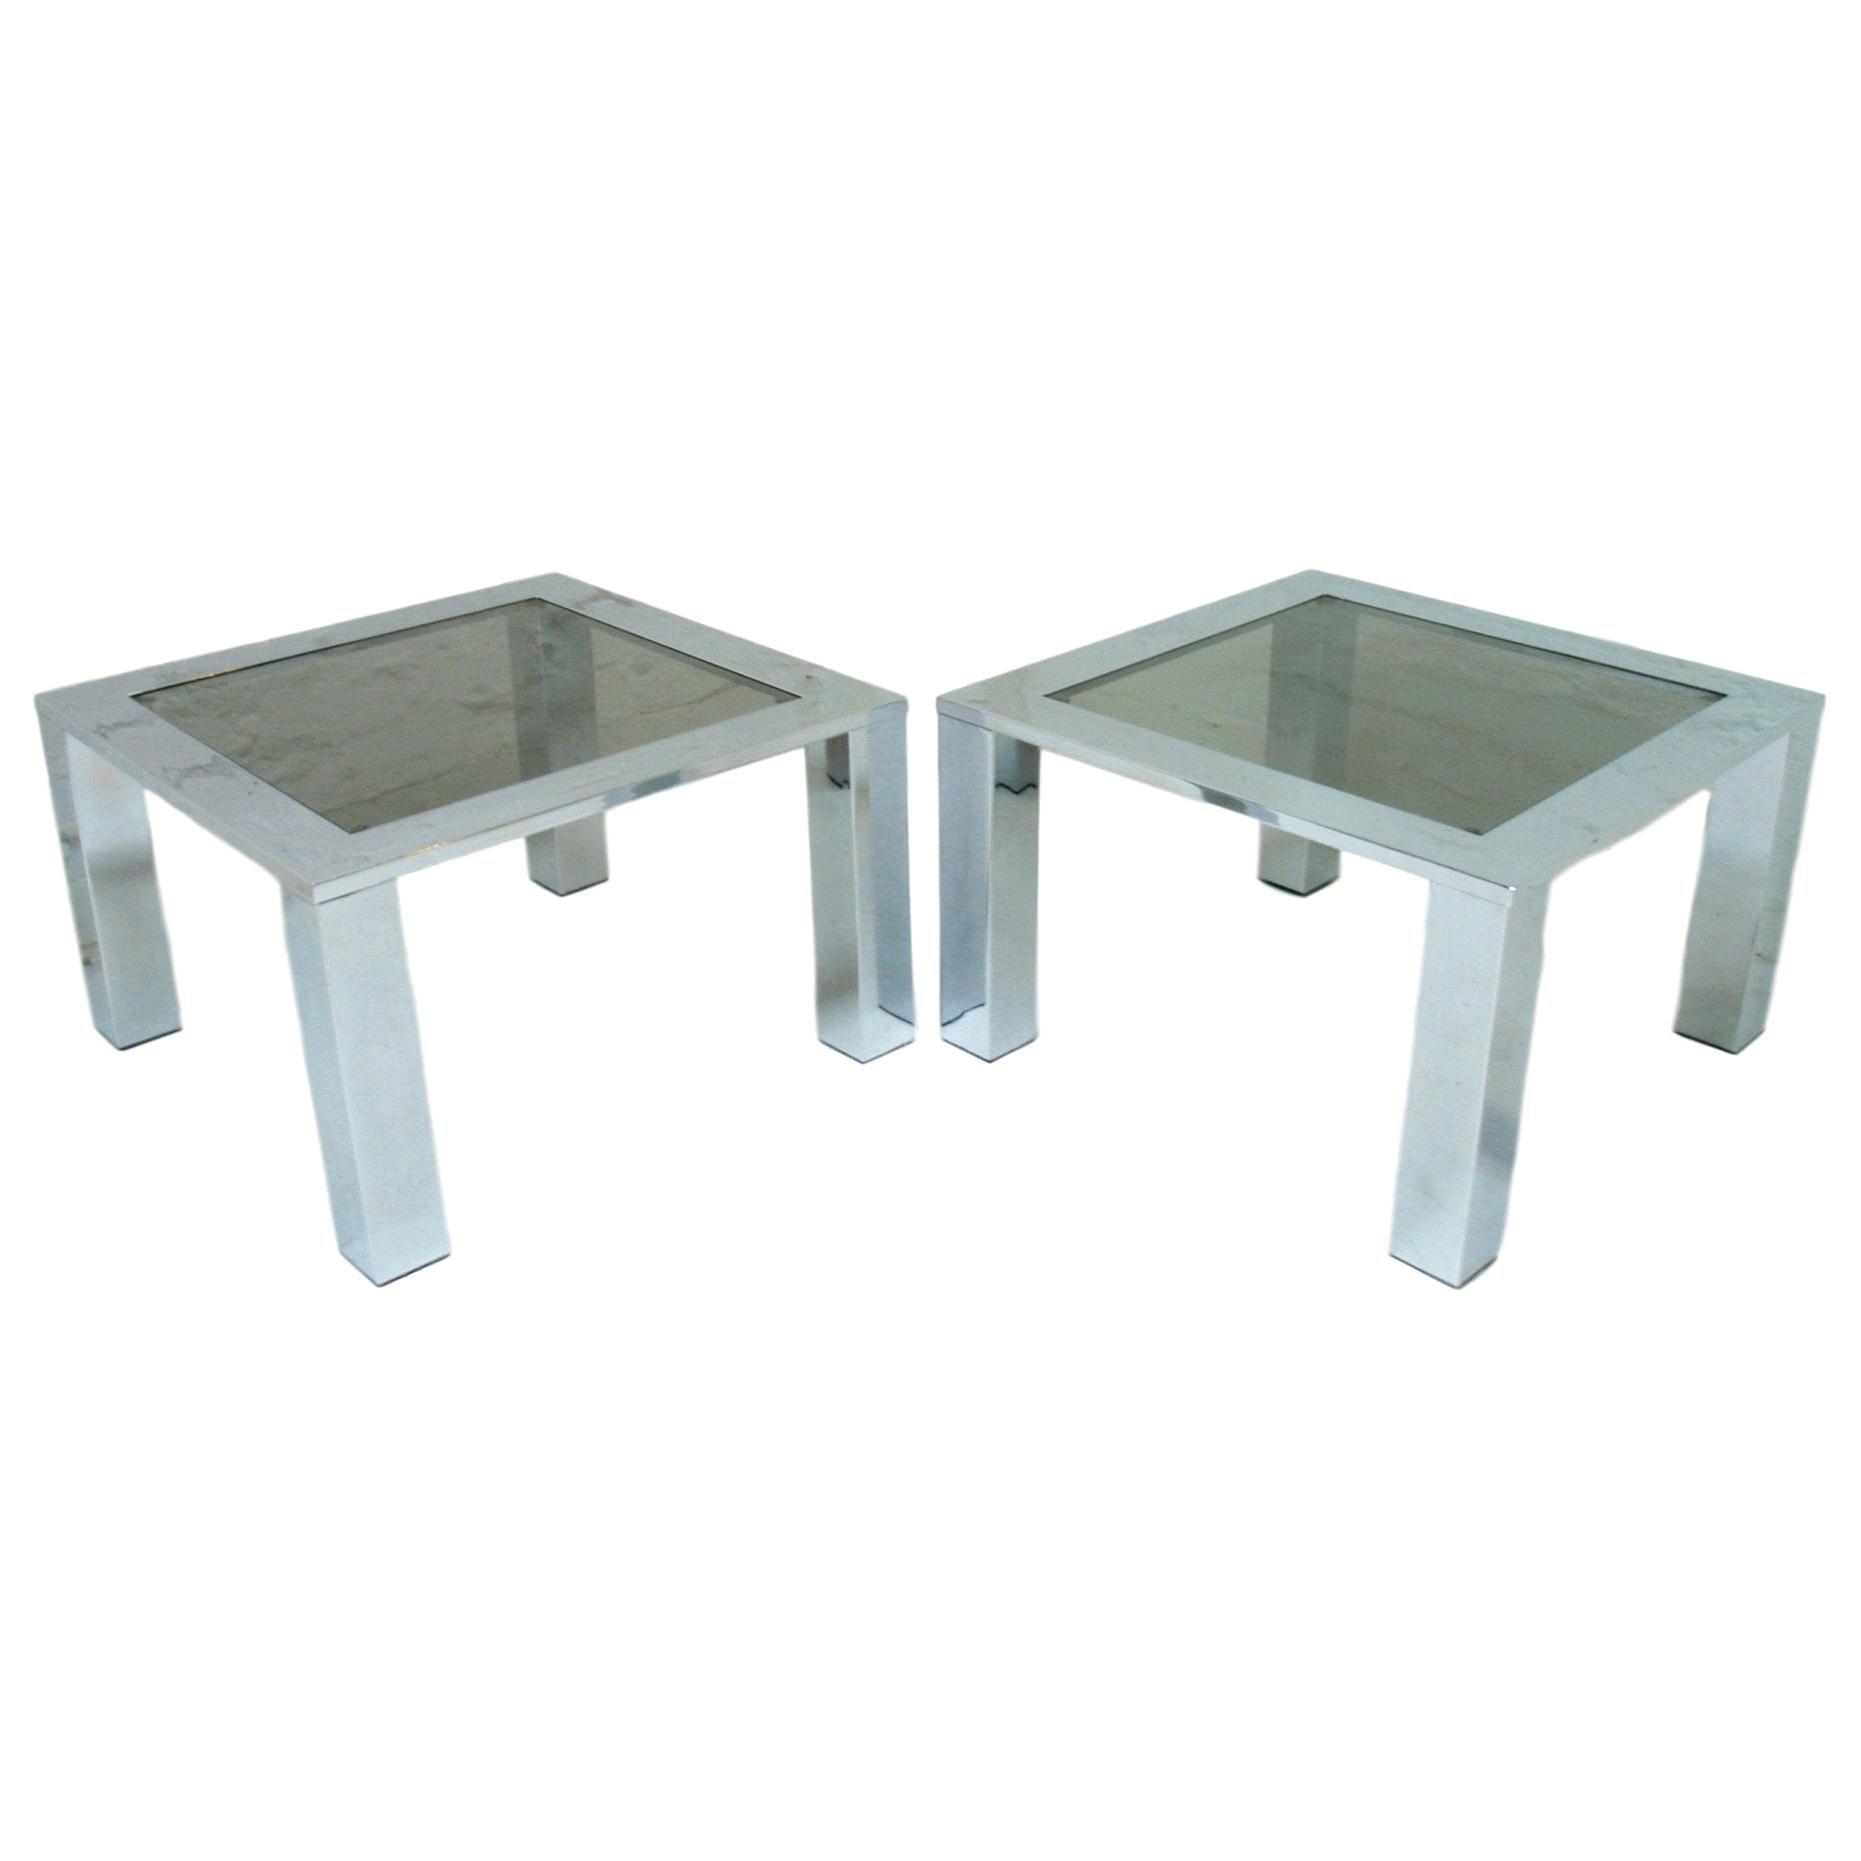 Large Chrome and Glass Coffee Tables Belgo Chrome Belgochrom circa 1978